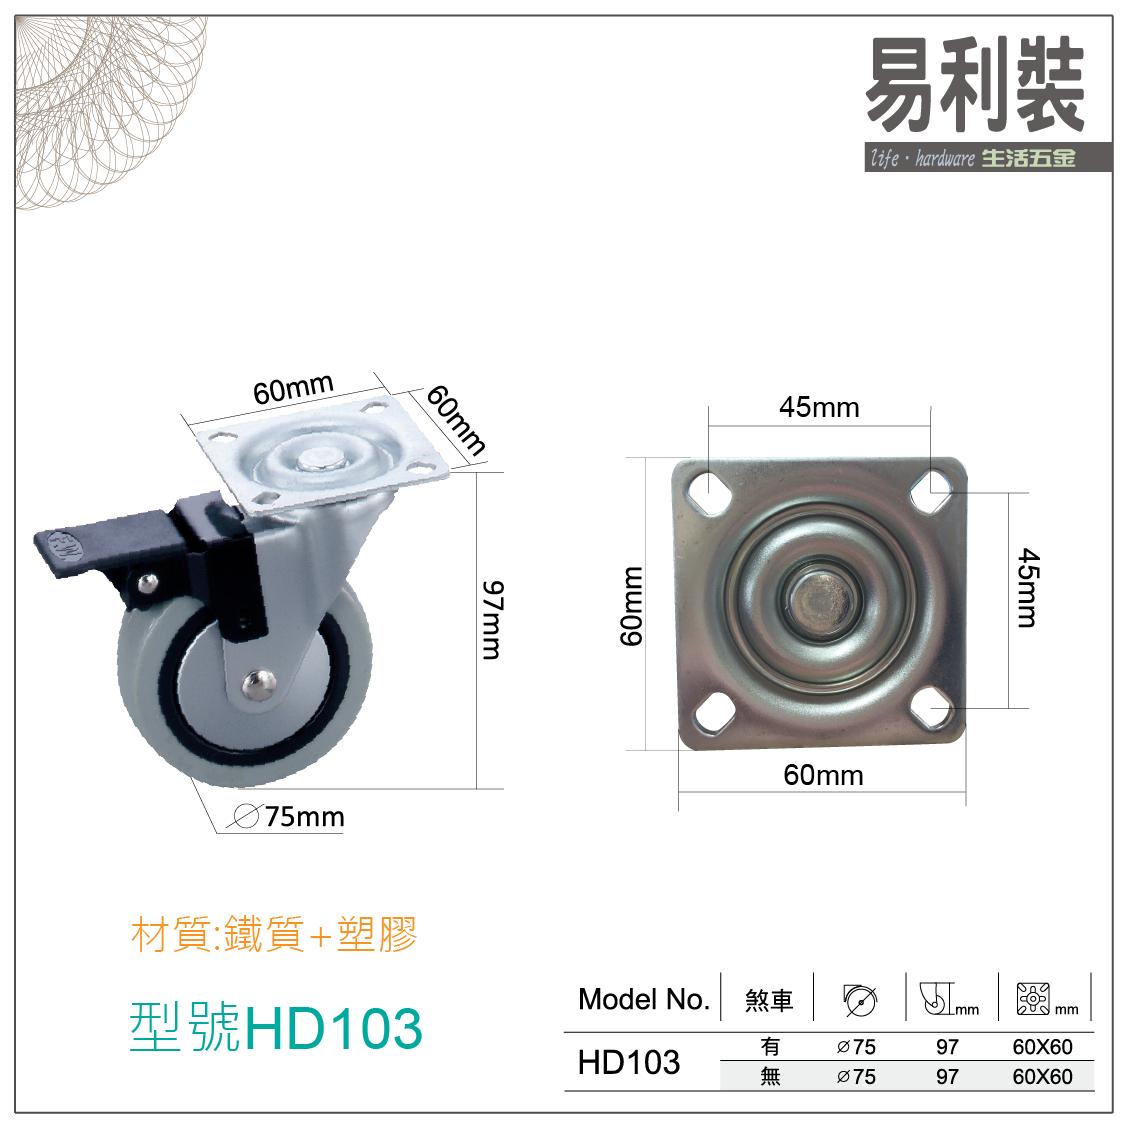 【 EASYCAN  】HD103-活動輪 易利裝生活五金 桌輪 櫃輪 房間 臥房 衣櫃 小資族 辦公家具 系統家具 1